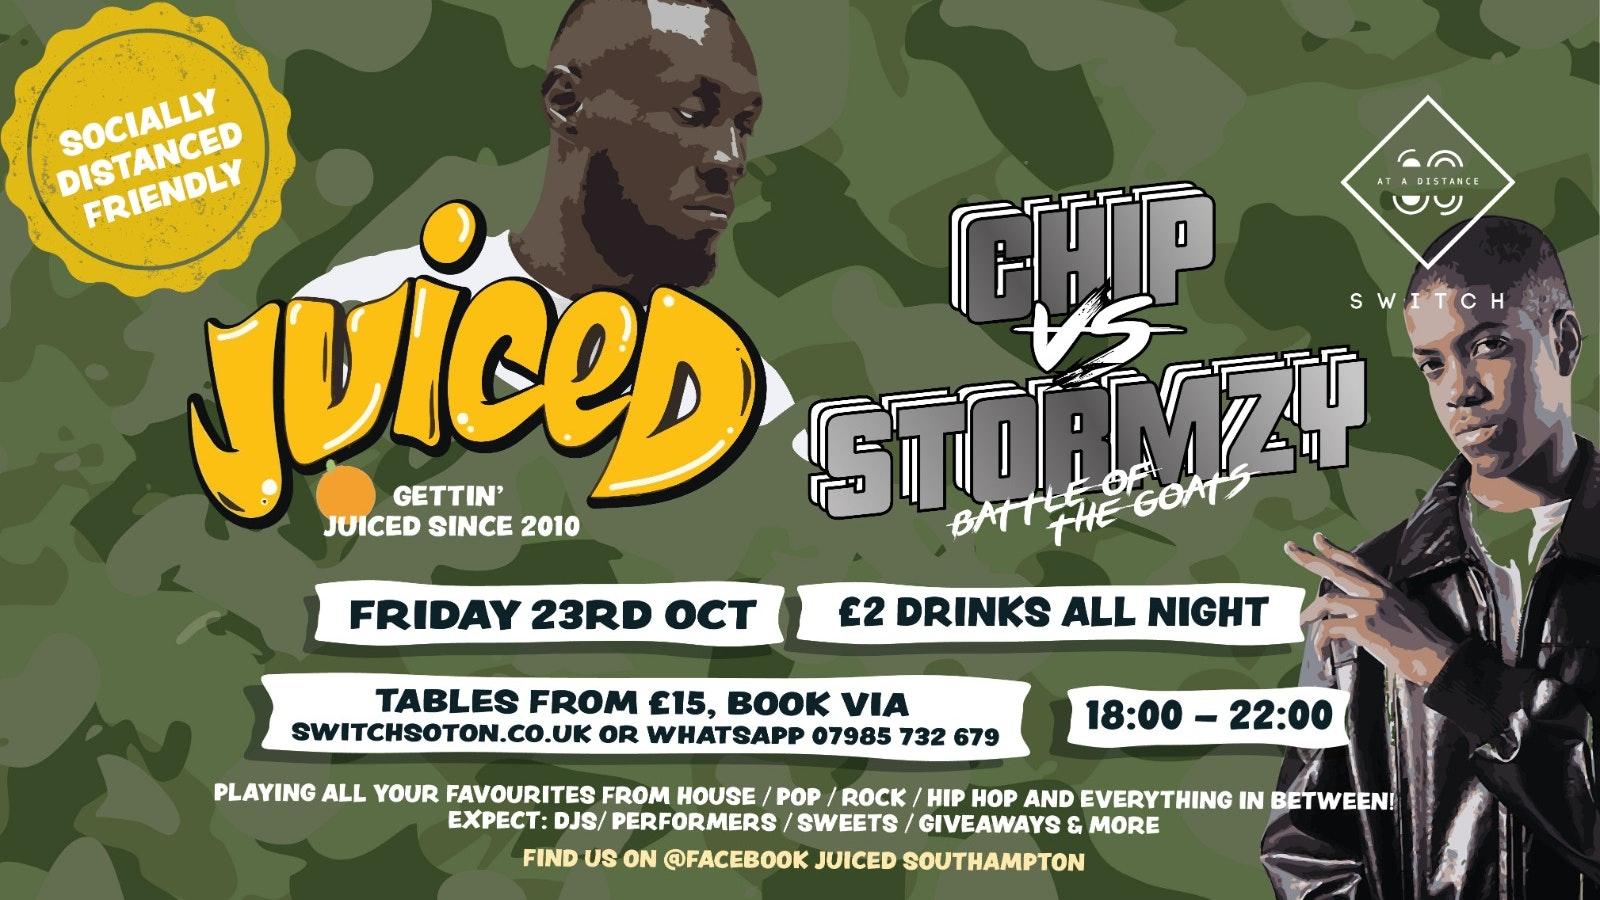 Juiced: Chip v Stormzy – Battle of the GOATS